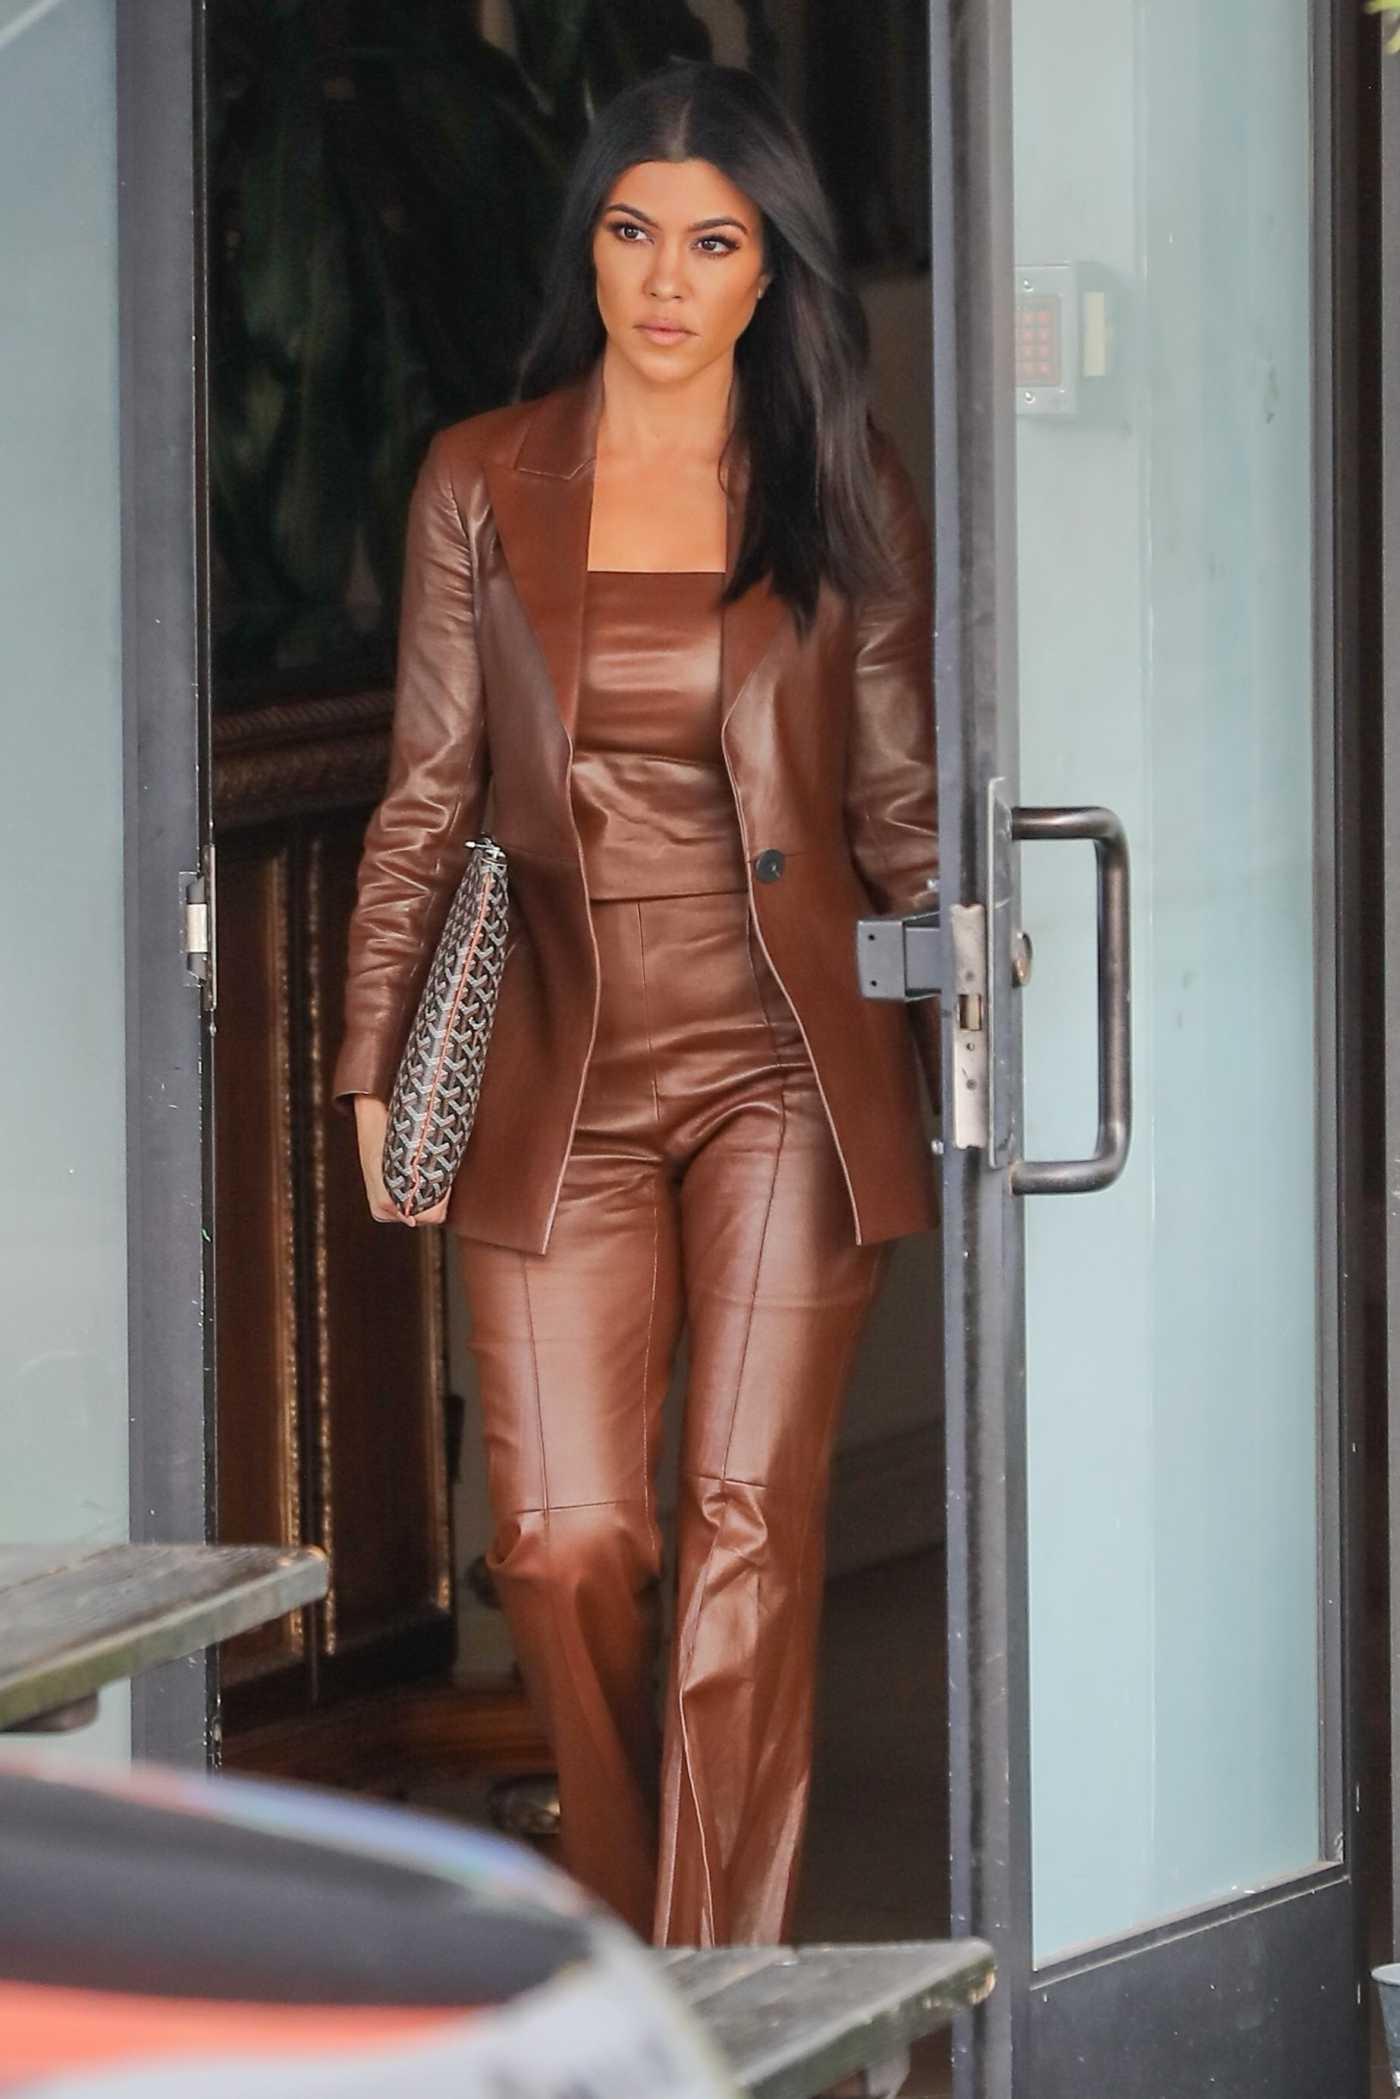 Kourtney Kardashian in a Brown Suit Leaves the Studio in Los Angeles 02/05/2020